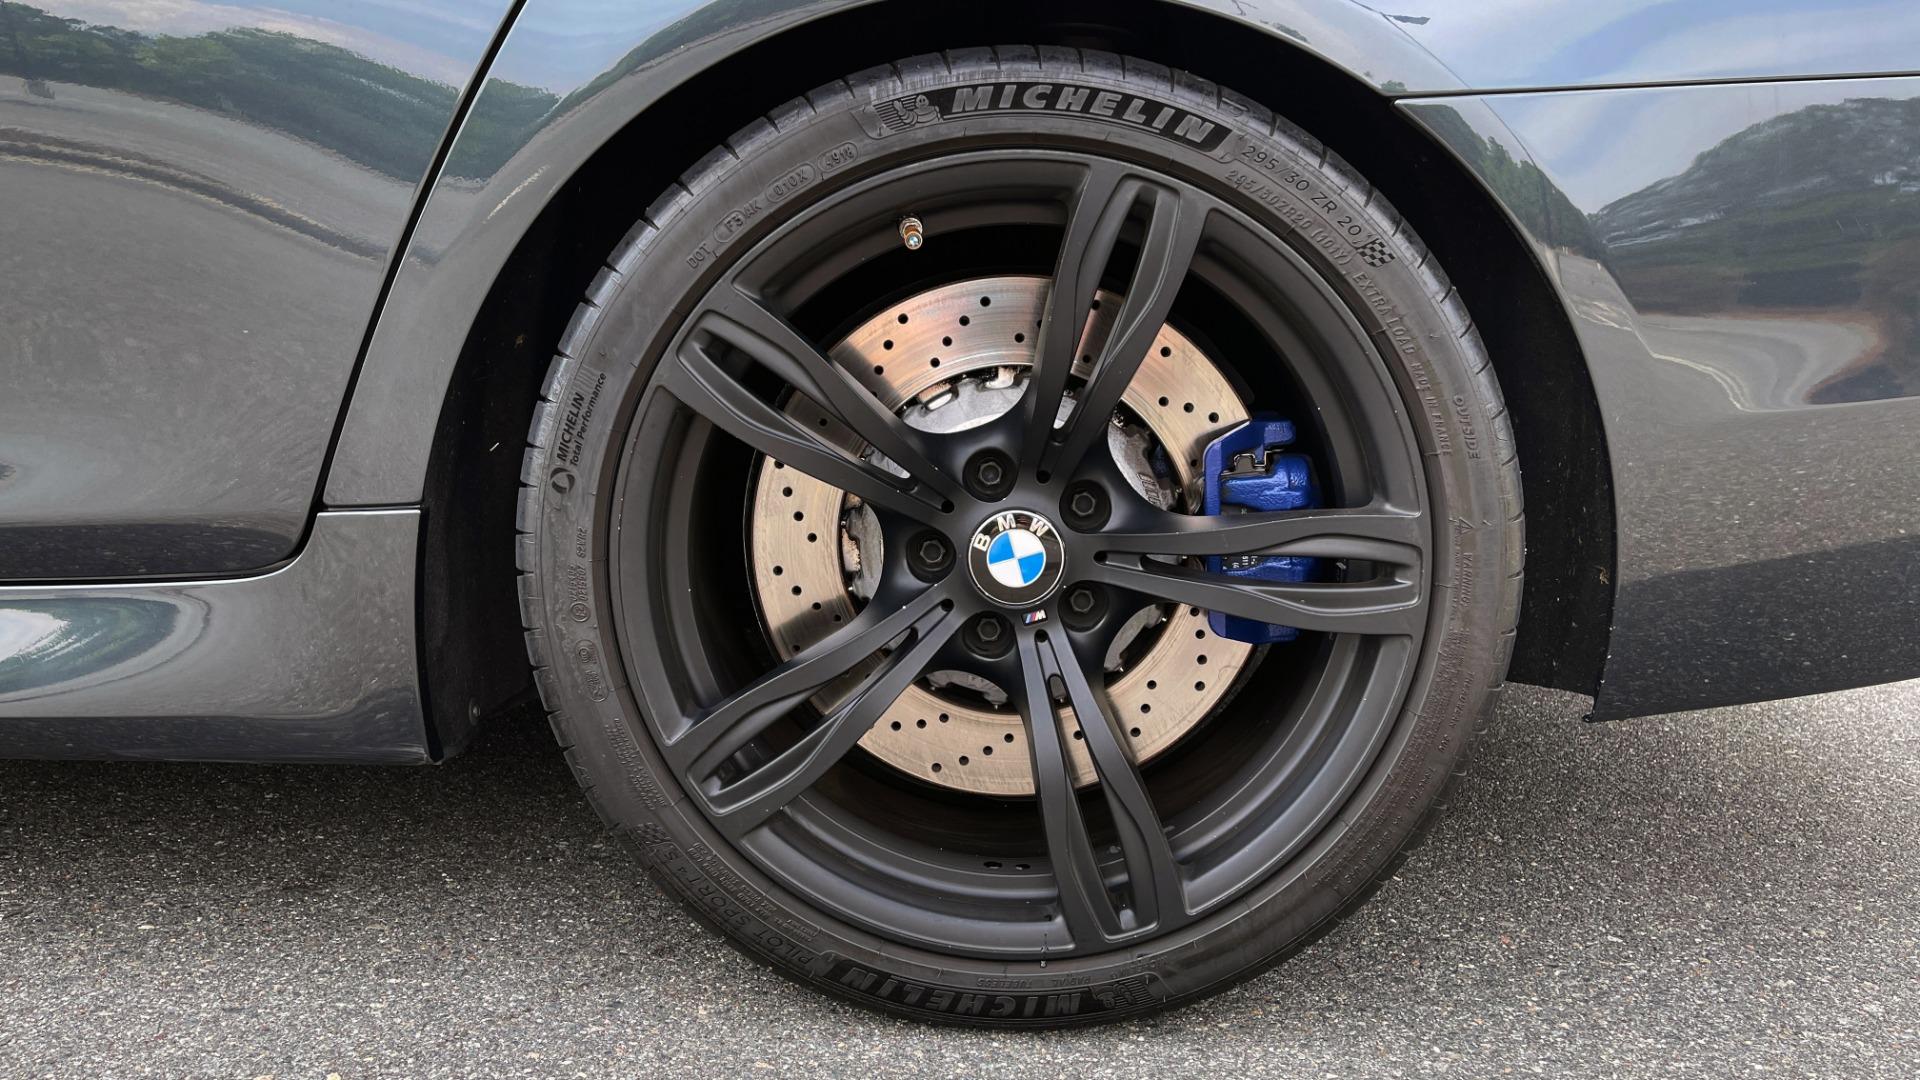 Used 2015 BMW M5 SEDAN / EXEC PKG / HUD / NAV / B&O SND / SUNROOF / REARVIEW for sale Sold at Formula Imports in Charlotte NC 28227 99